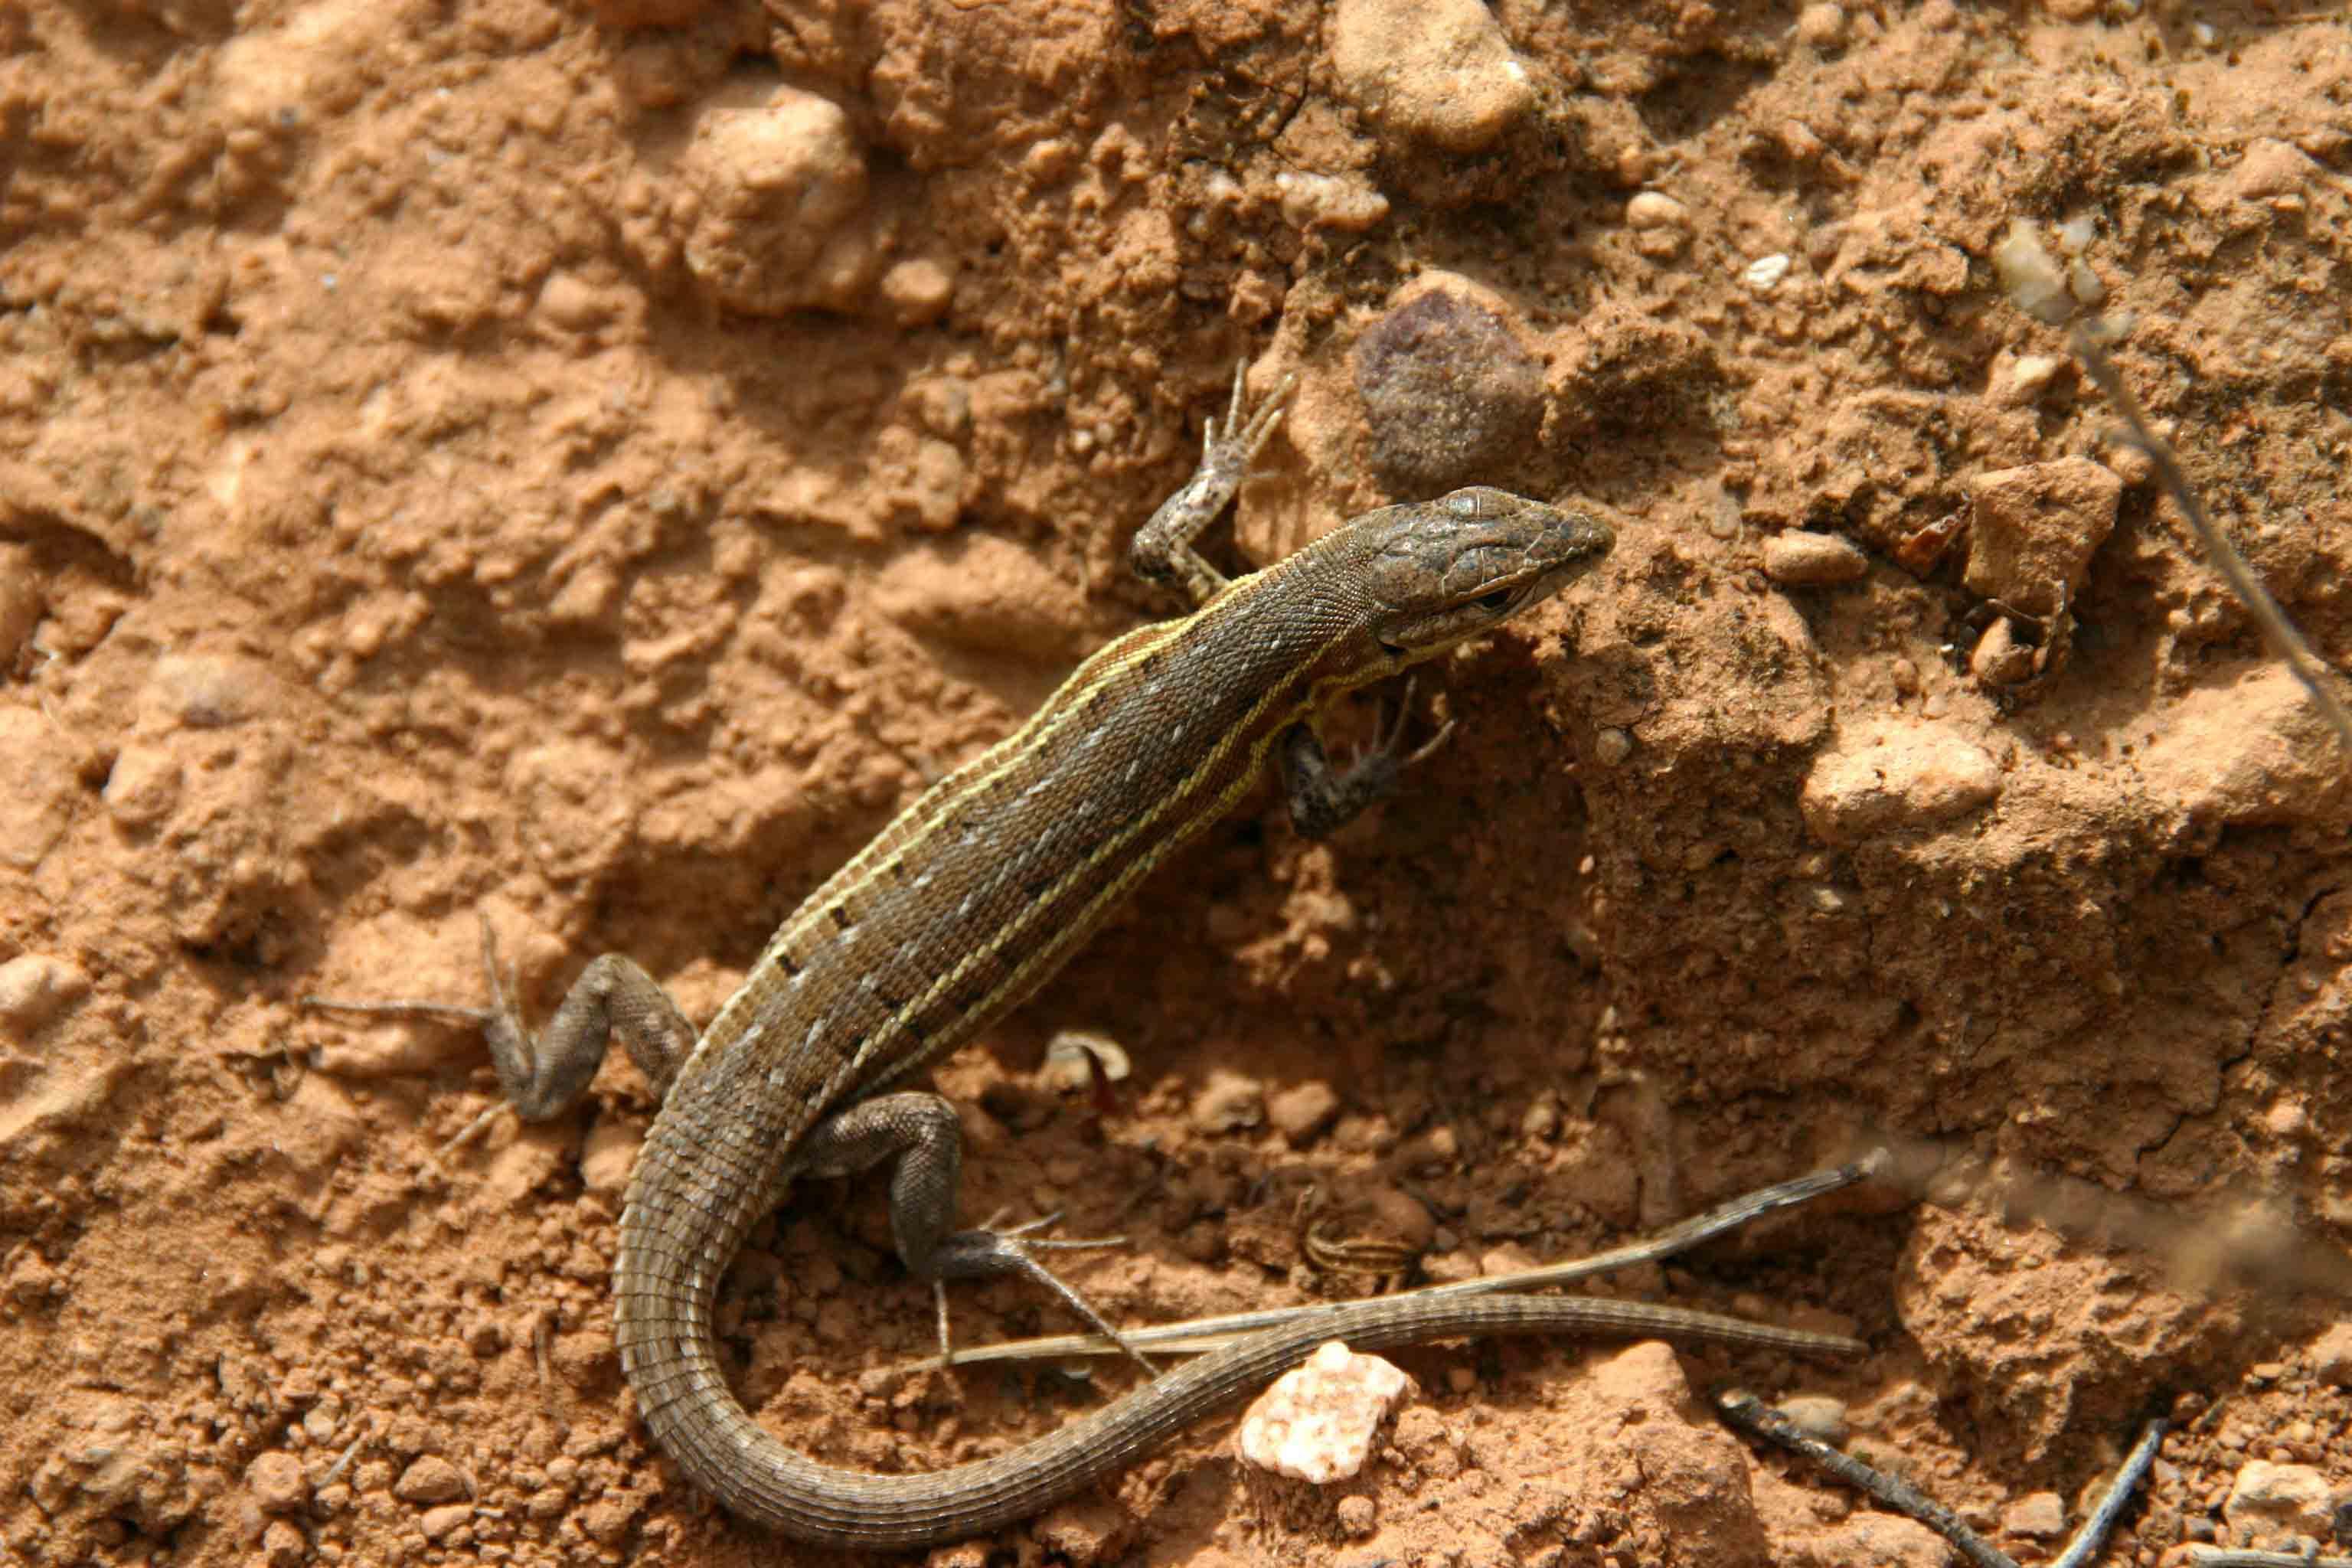 Spanish psammodromus (Psammodromus hispanicus)